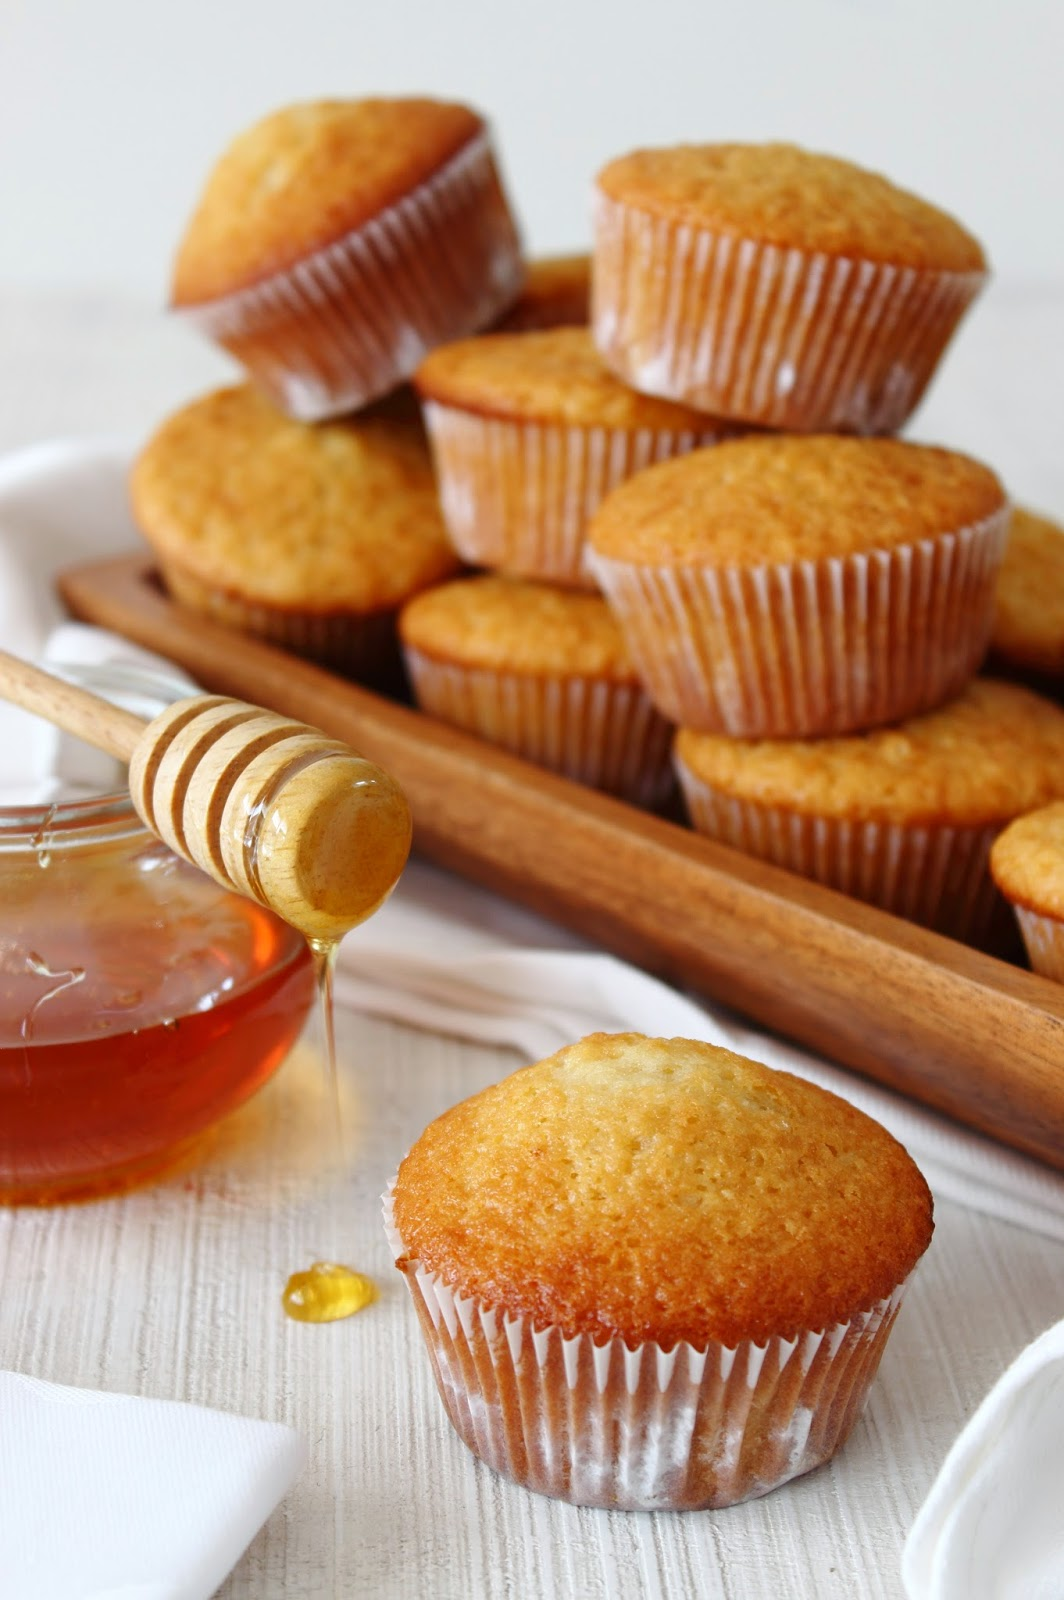 Honing muffins